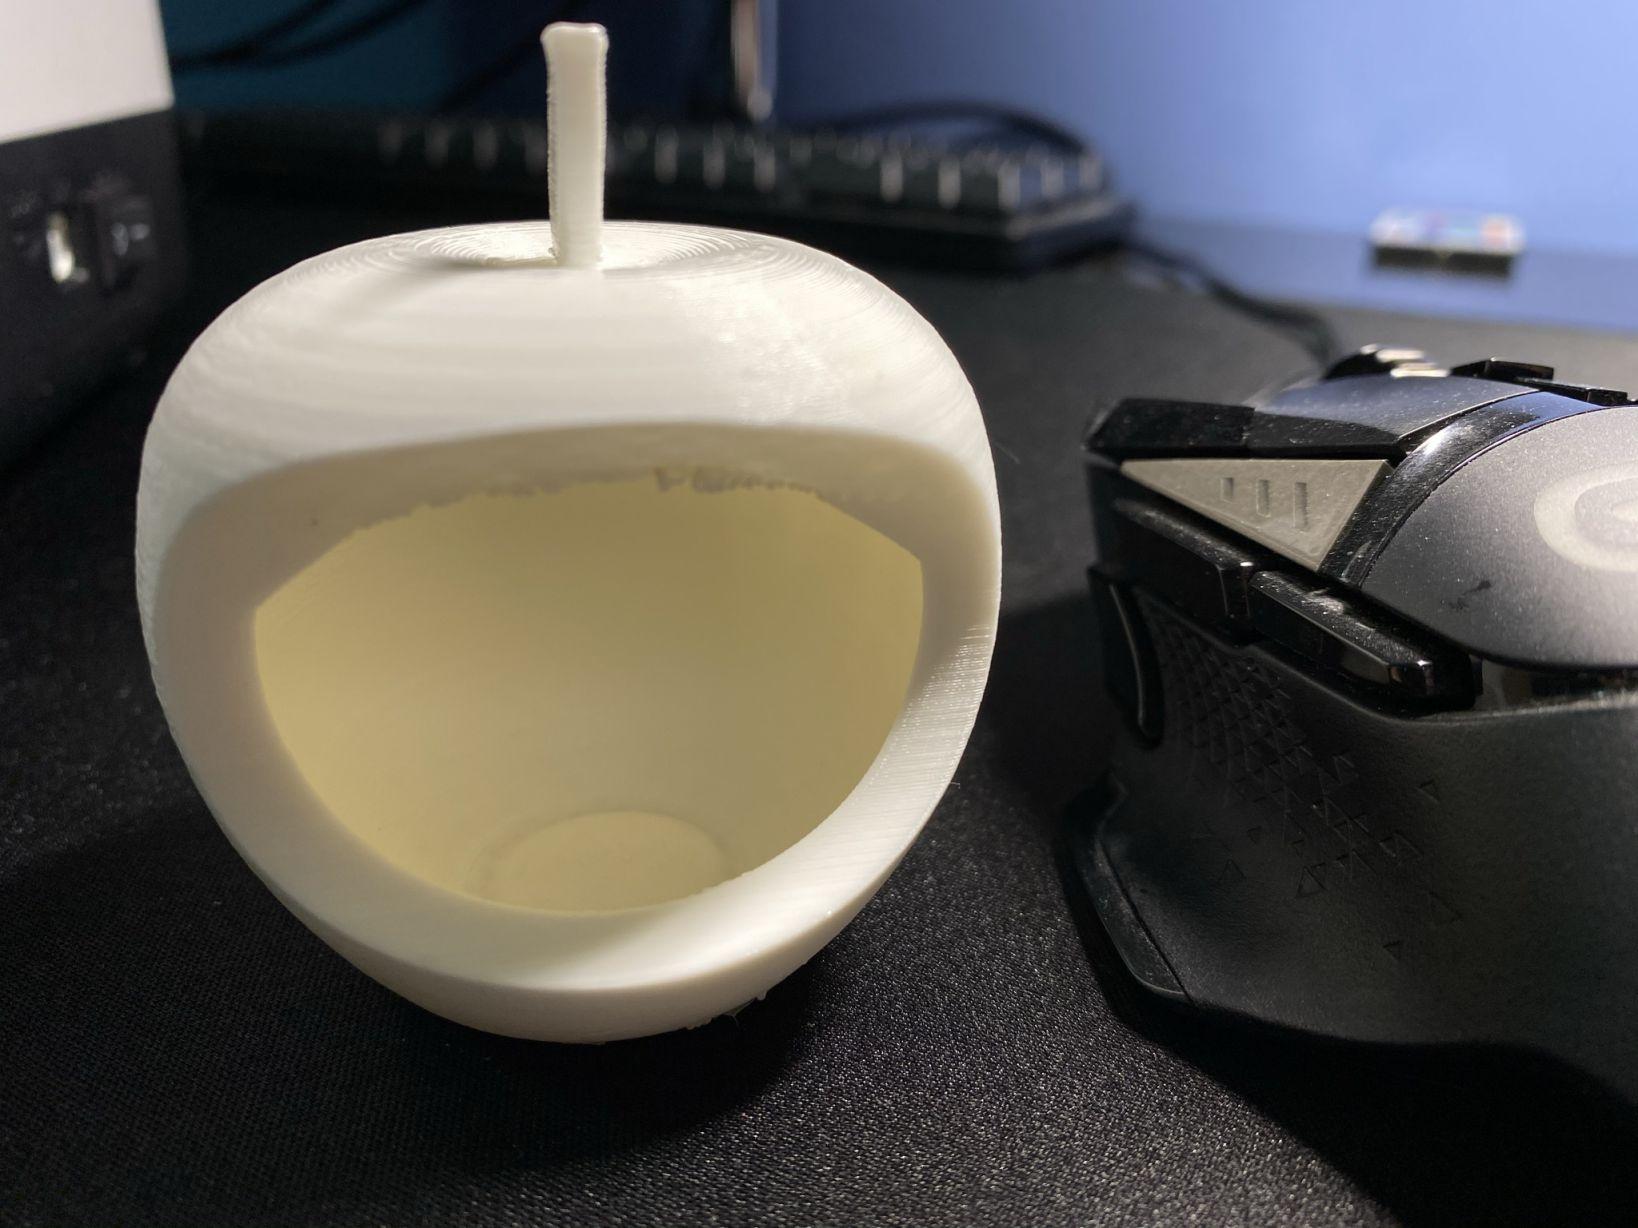 recensione-stampante-3d-flucrum-minibot-46 Recensione FULCRUM MINIBOT, Stampante 3D Facile e Veloce